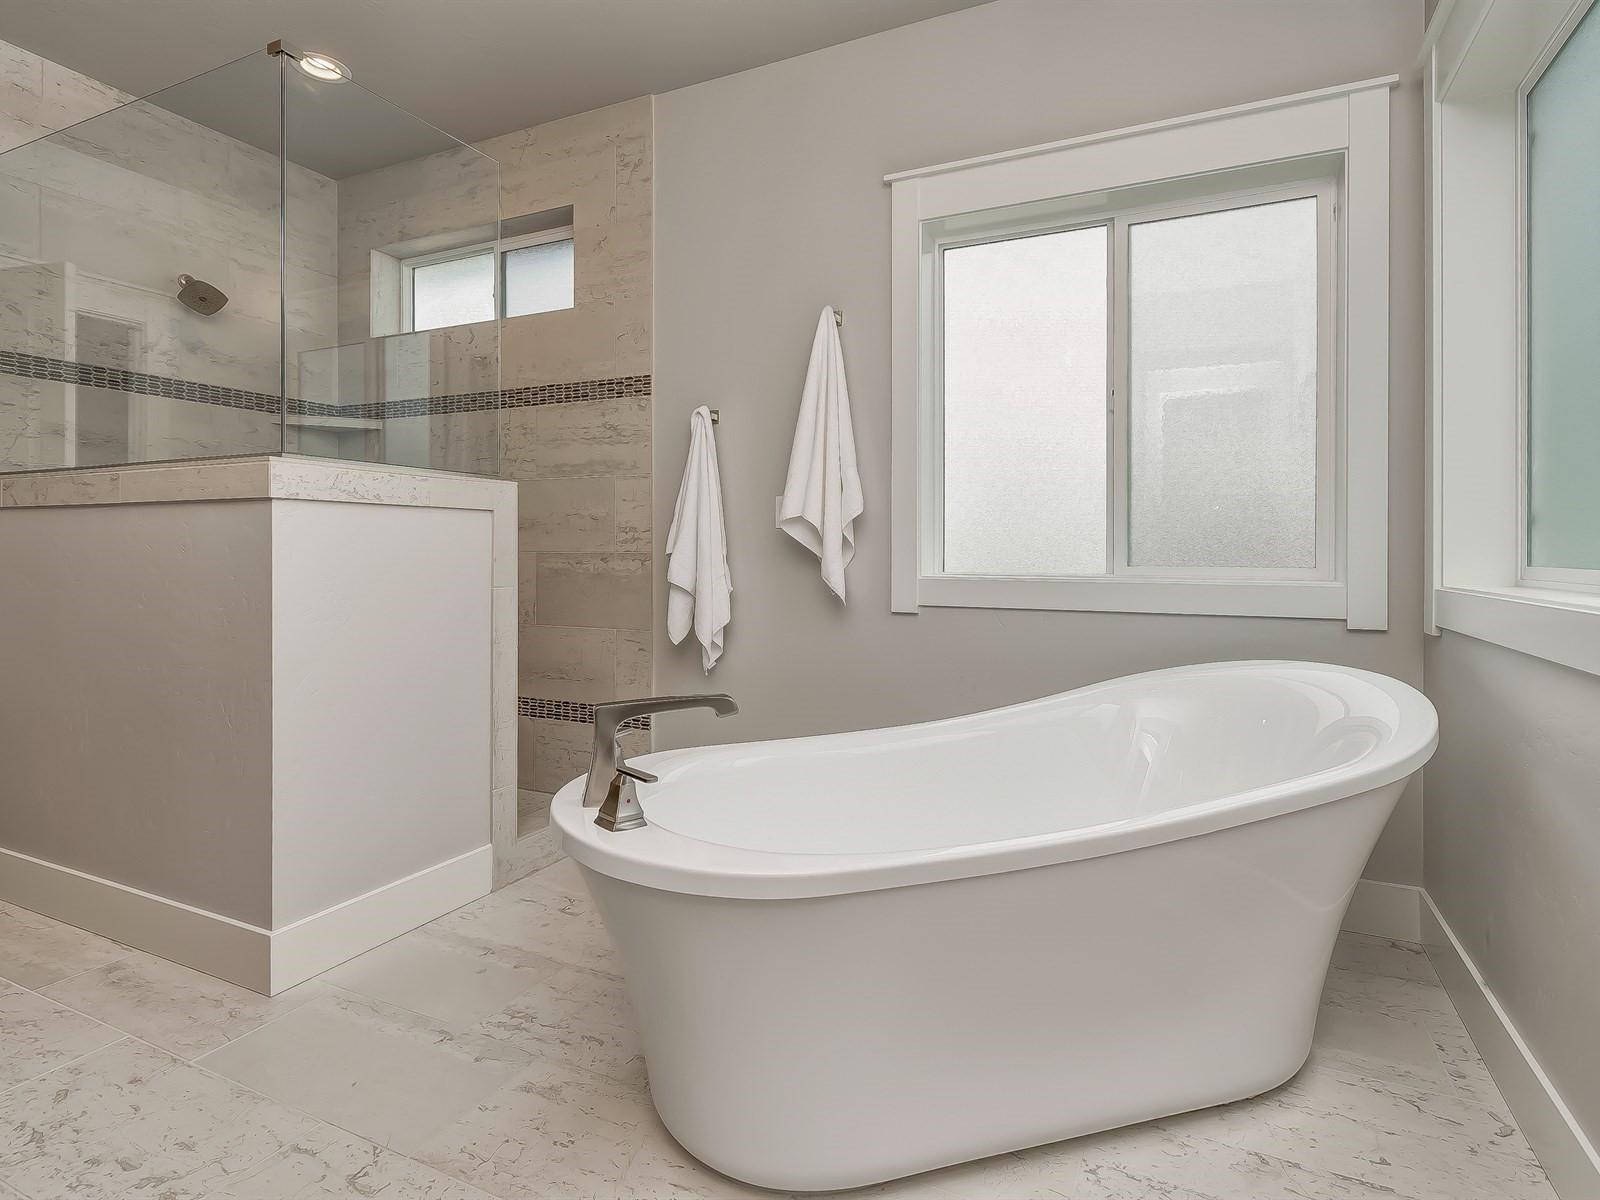 038_Master Bathroom .jpg